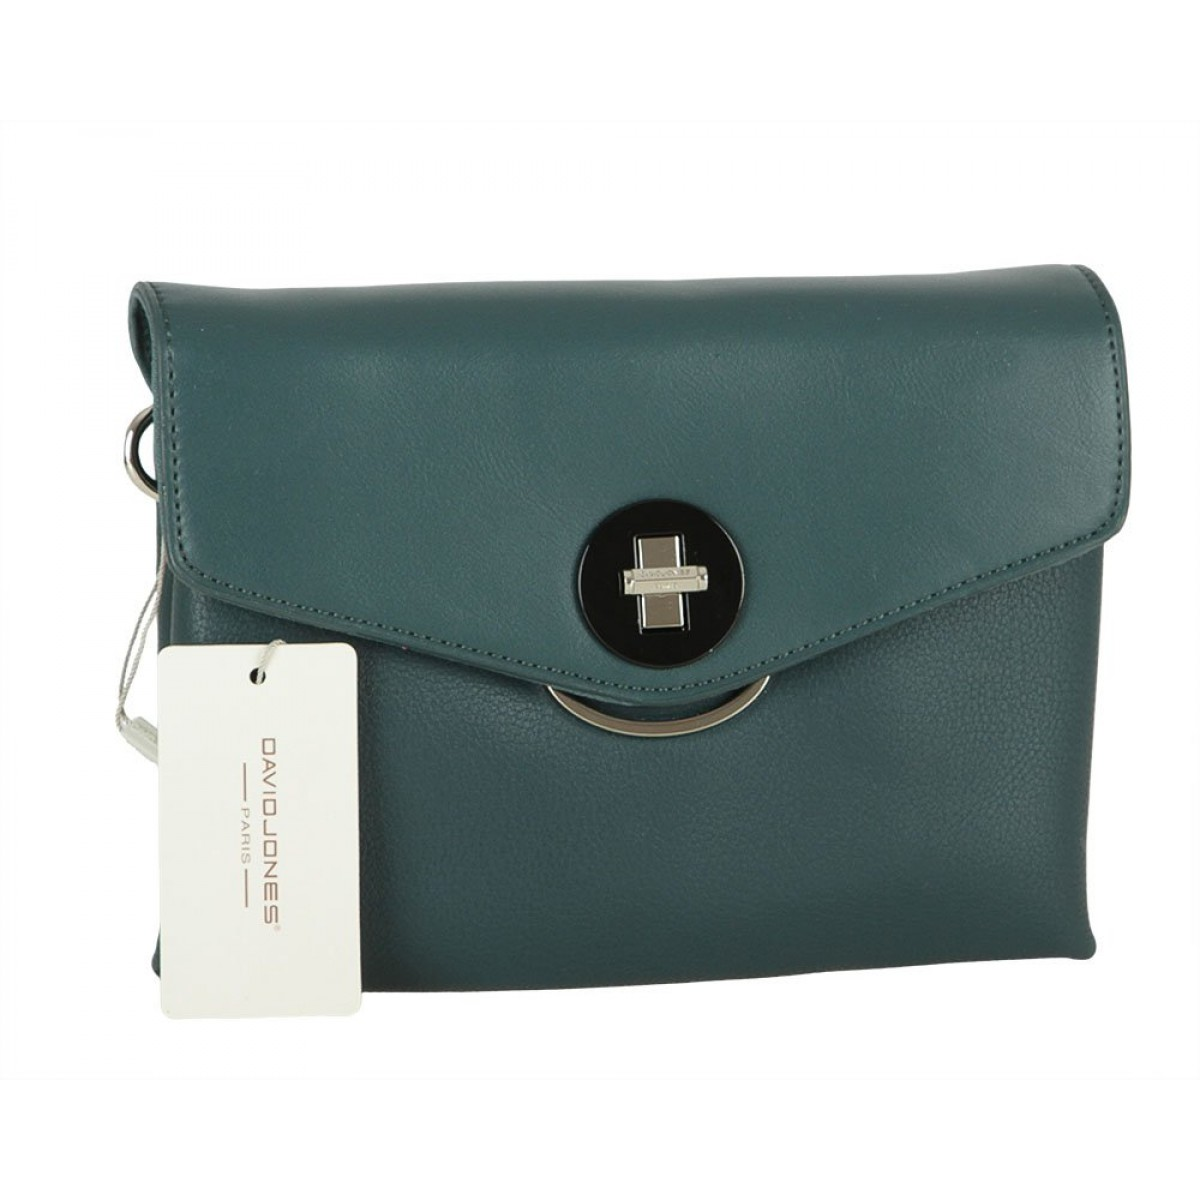 Жіноча сумка David Jones 6414-1 PEACOCK BLUE